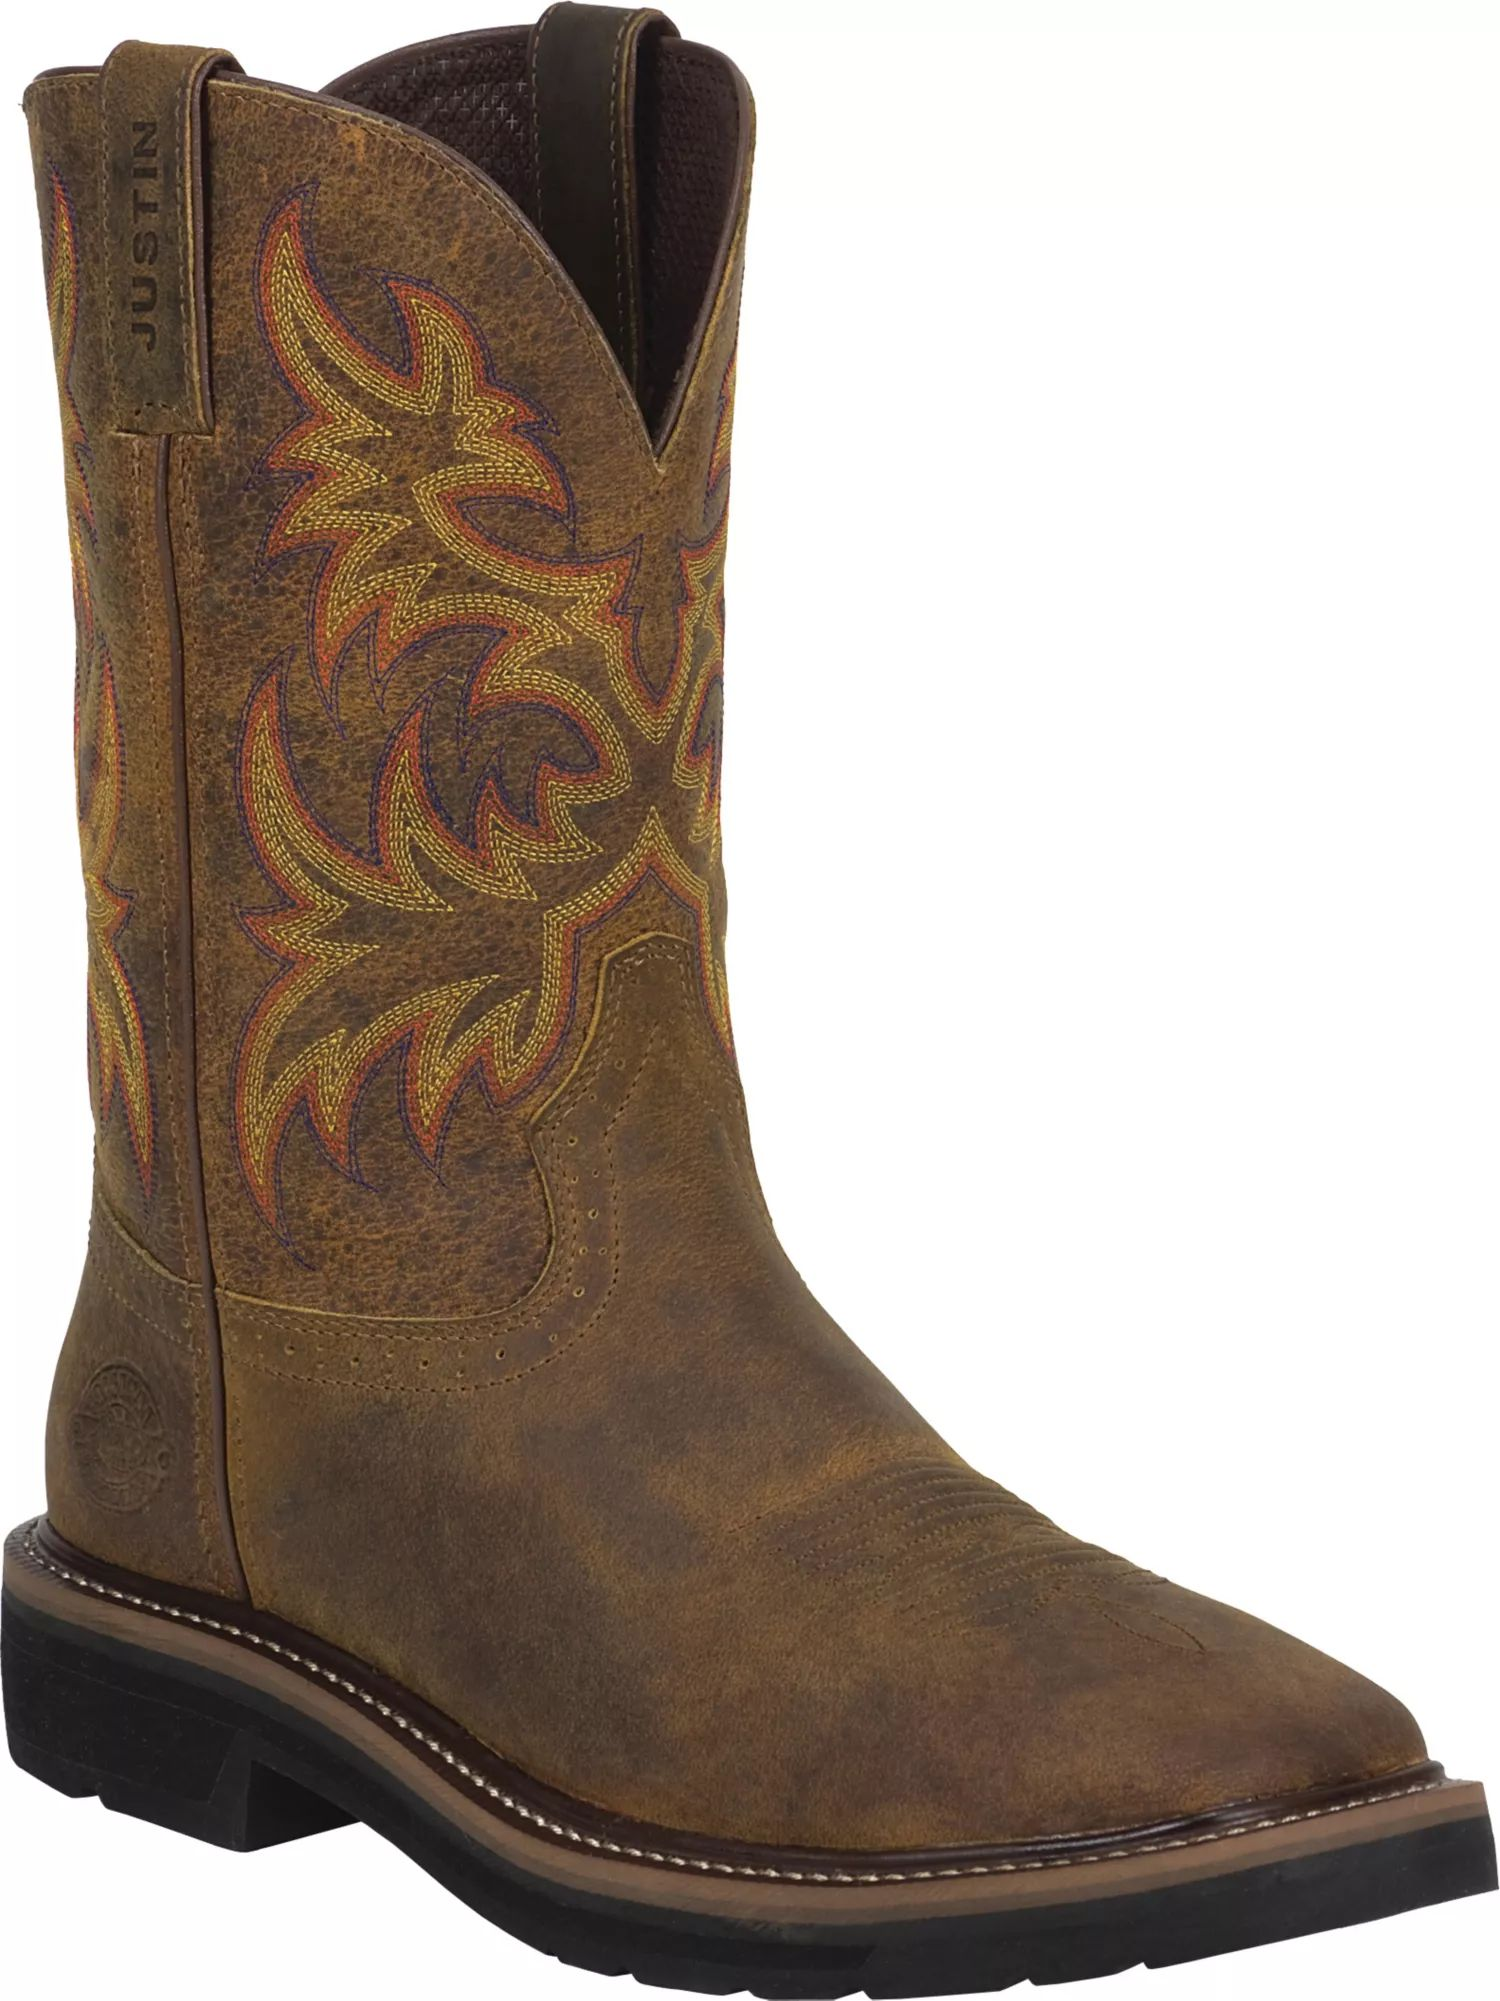 Justin Boots SE4682